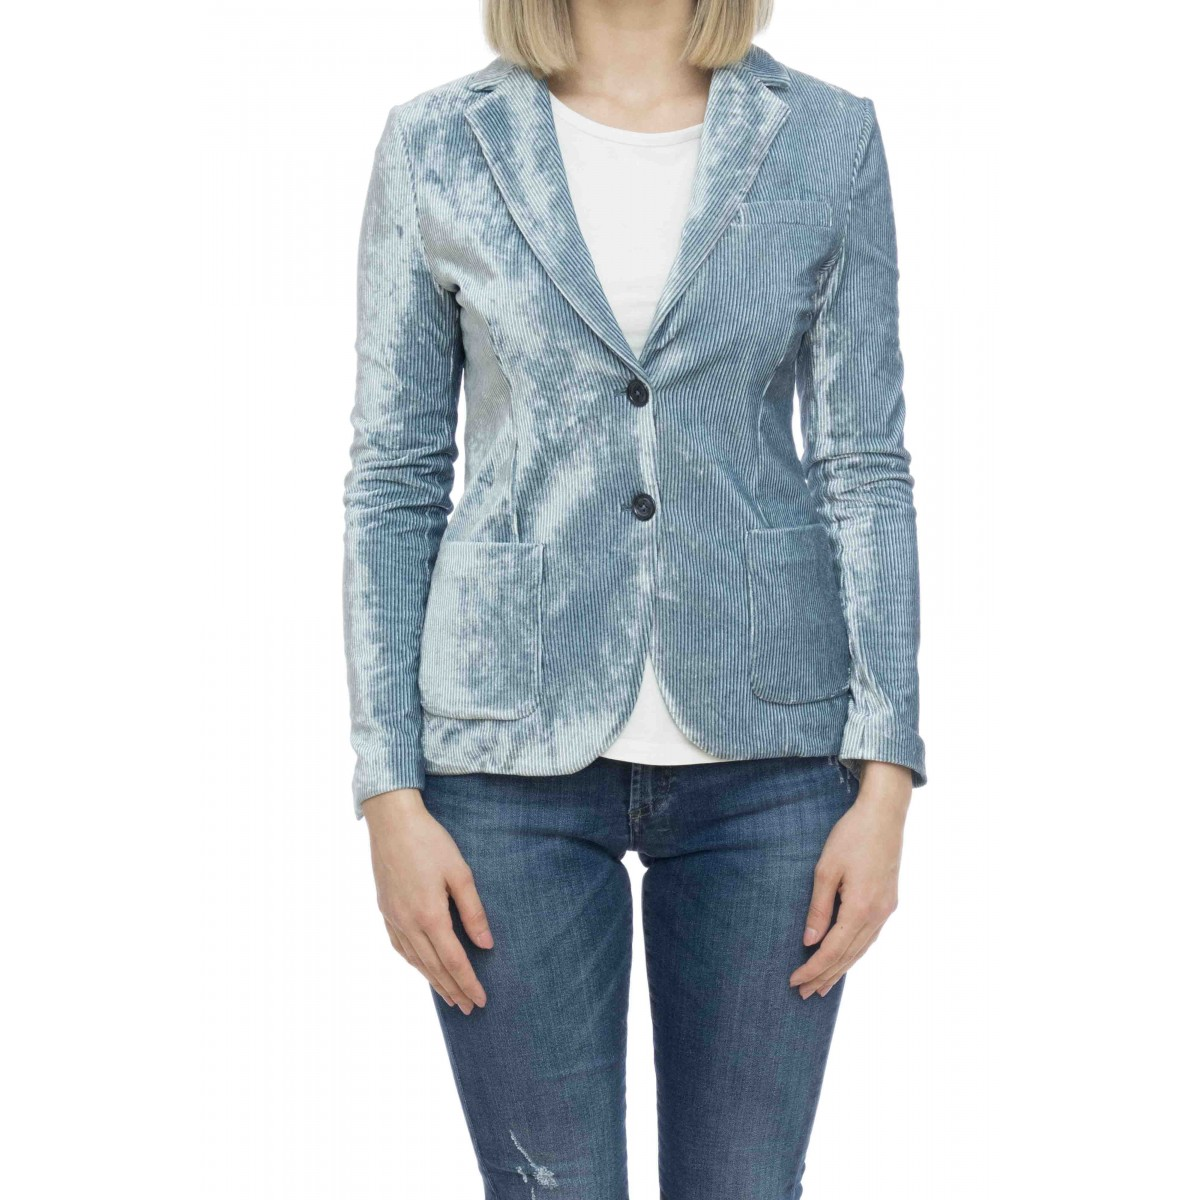 Giacca donna - Fd1343 giacca jersey velluto rigato